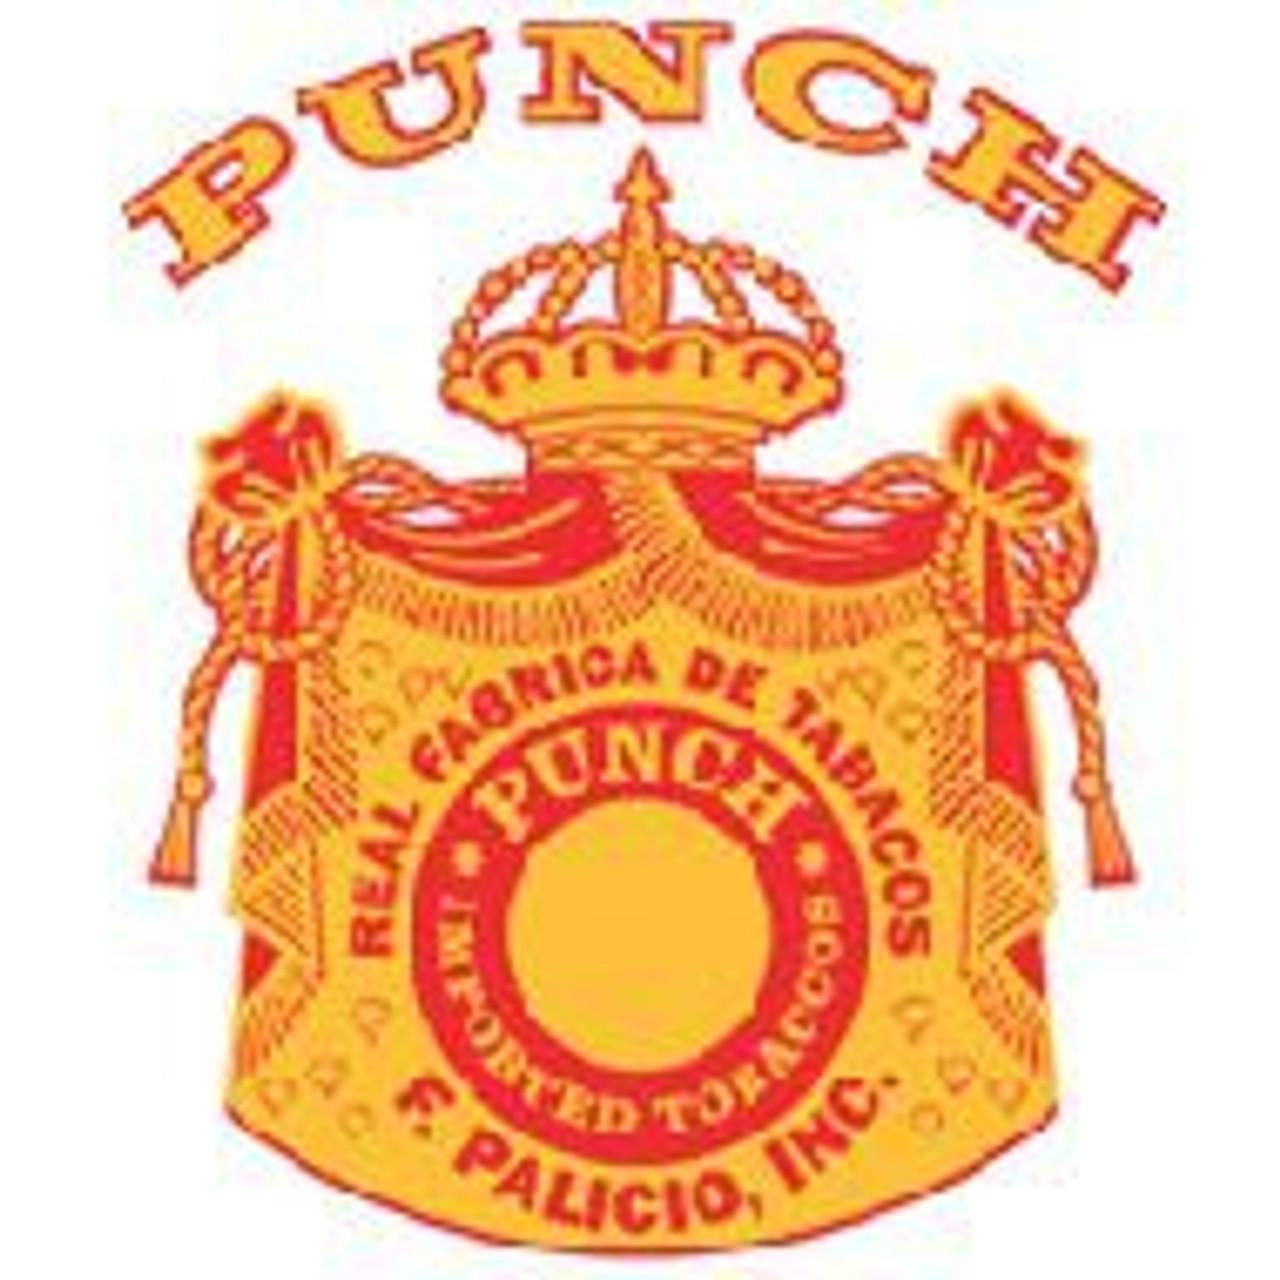 Punch Chateau L Maduro Cigars - 7 1/4 x 54 (Box of 25)